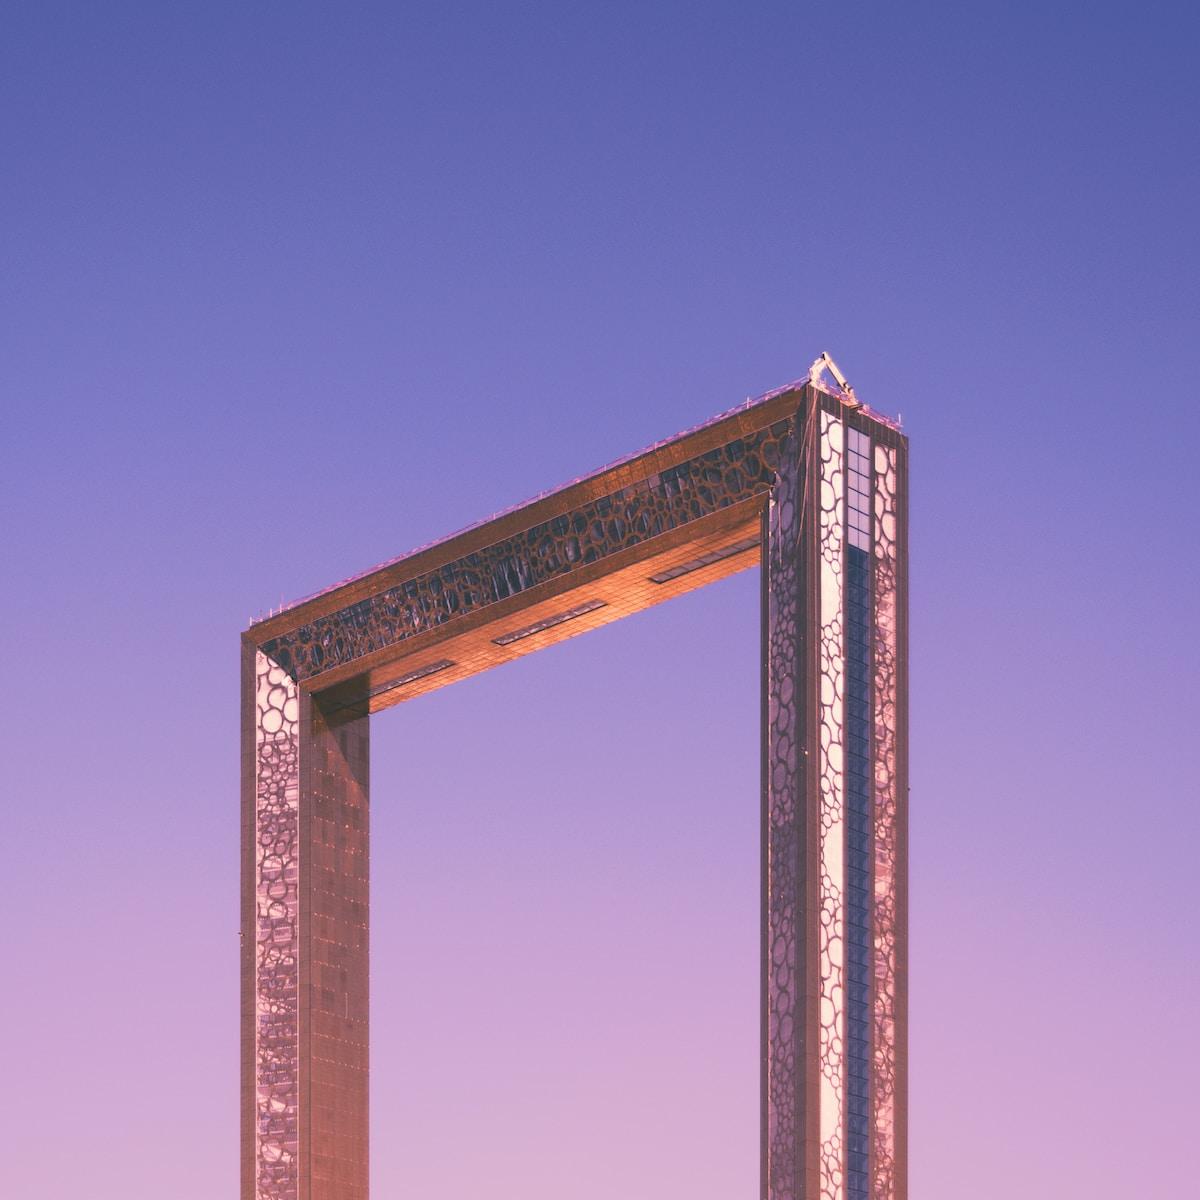 Dubai Frame - Places to Visit in Dubai